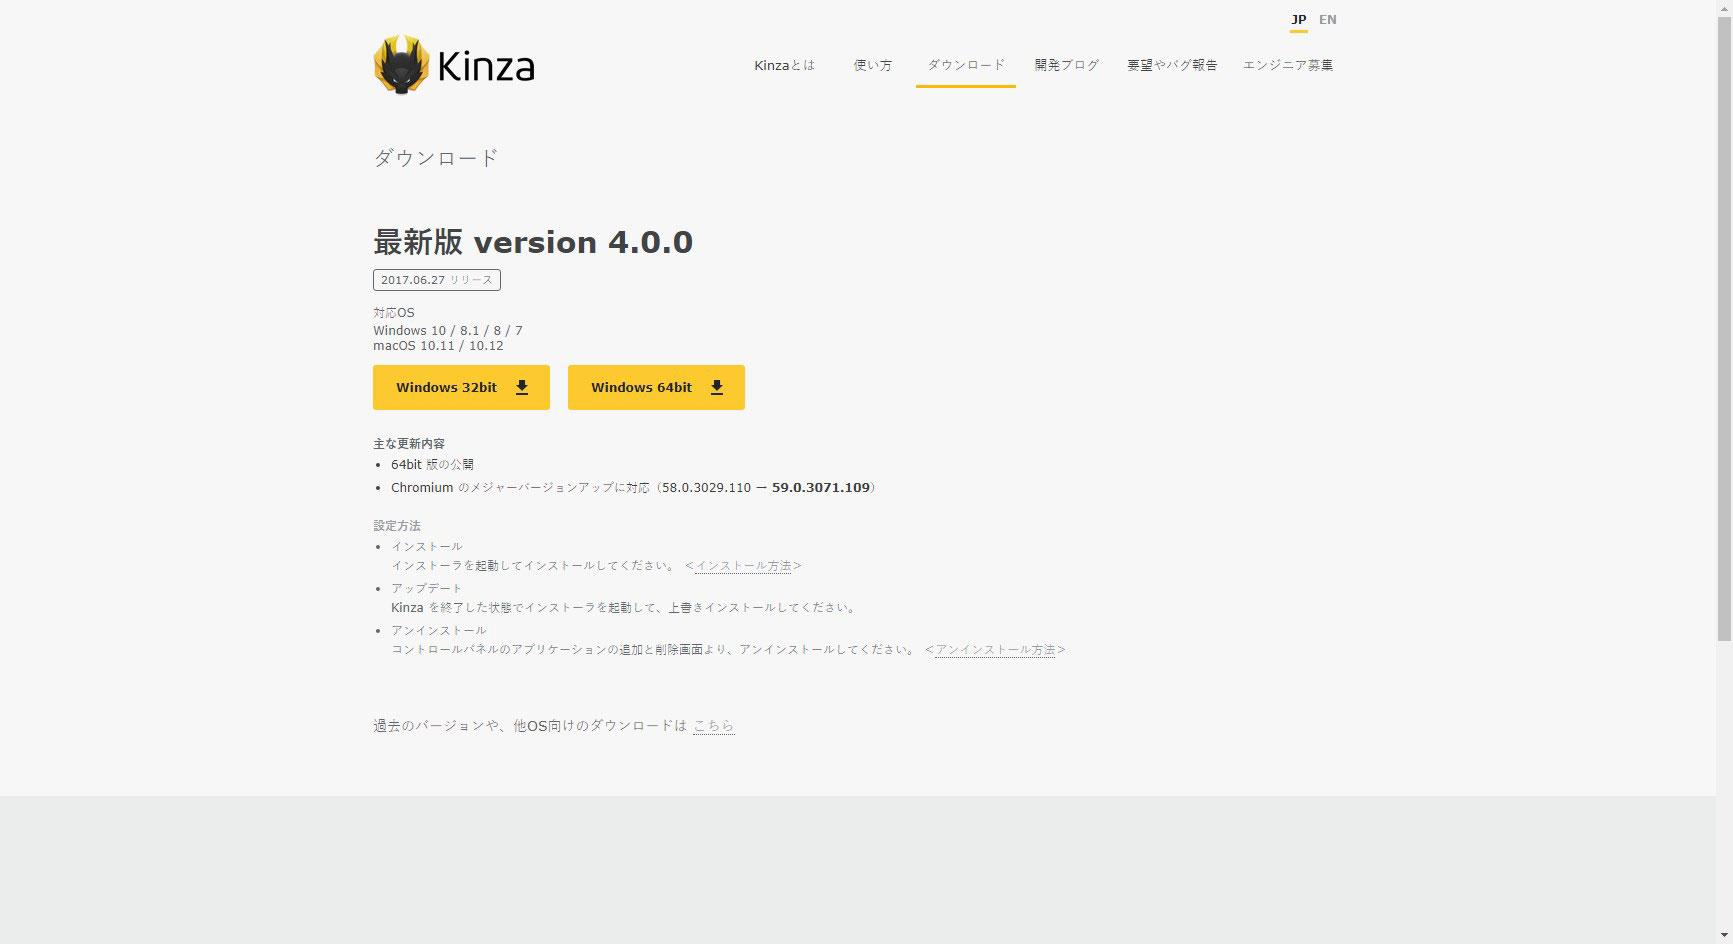 「Kinza」ダウンロードページ